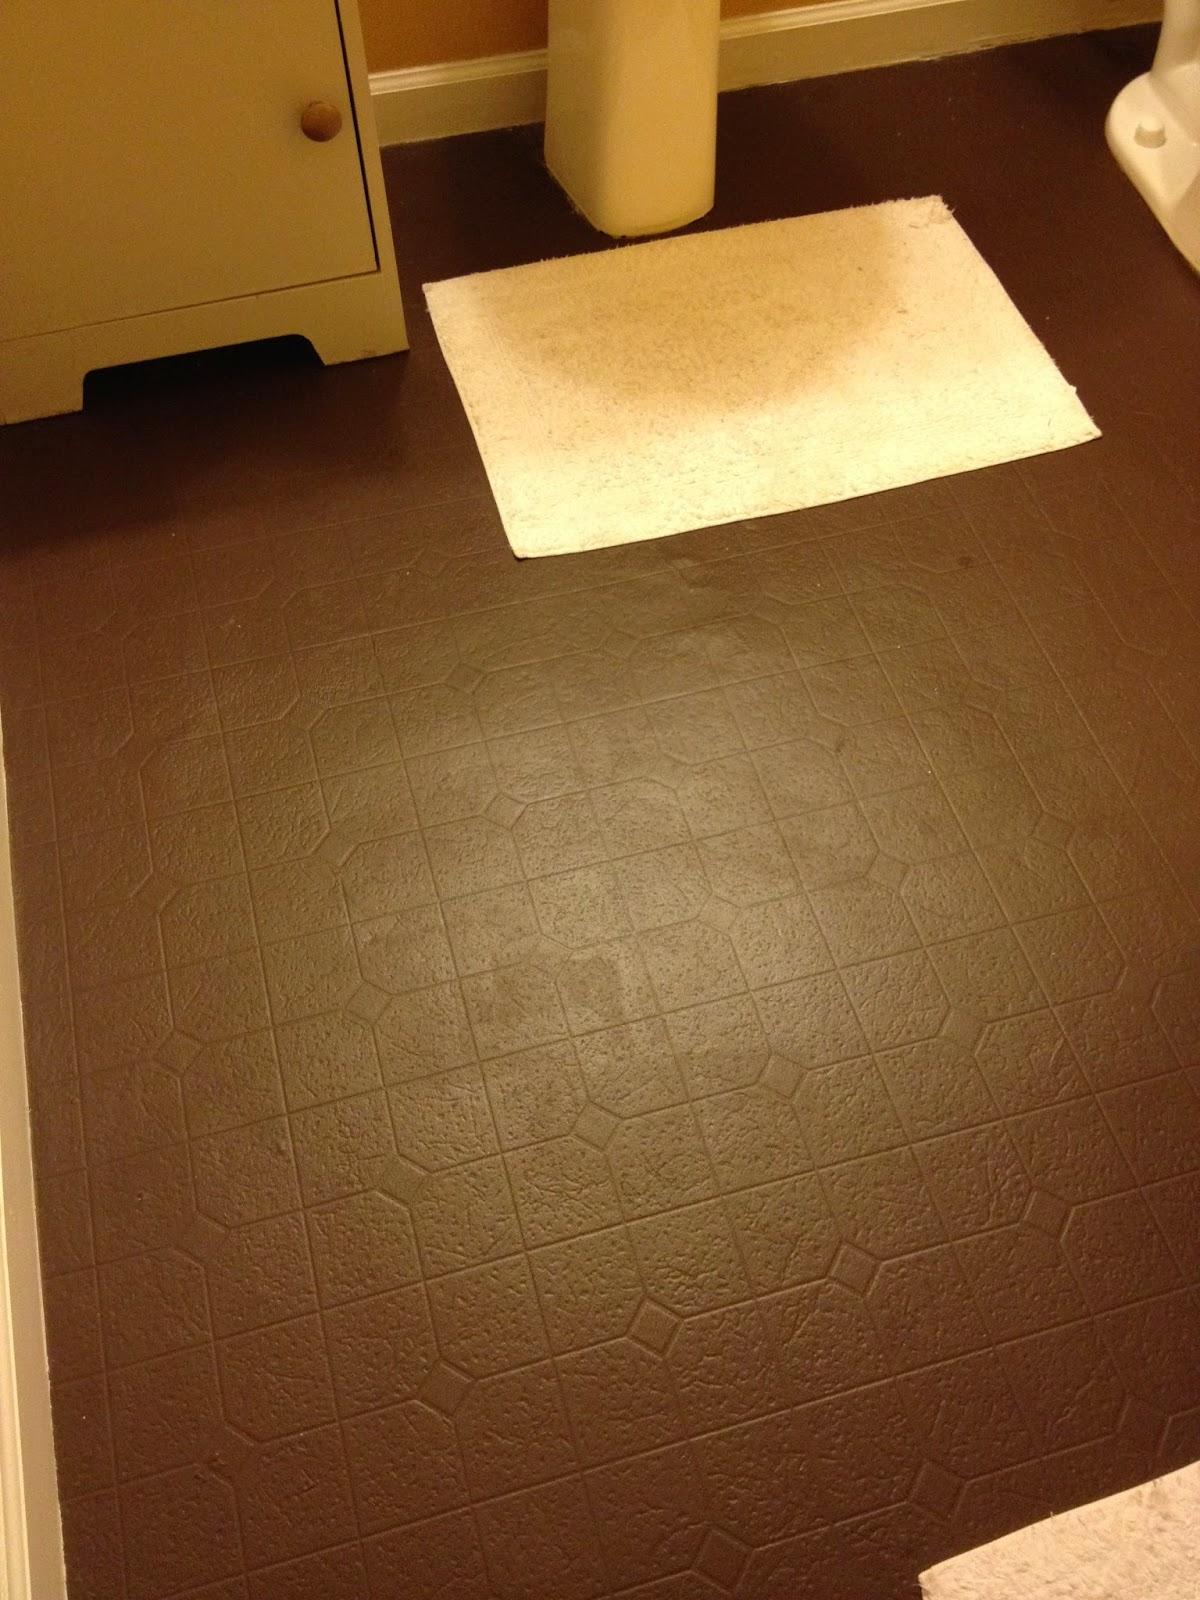 How Long Will Painted Vinyl Floors Last